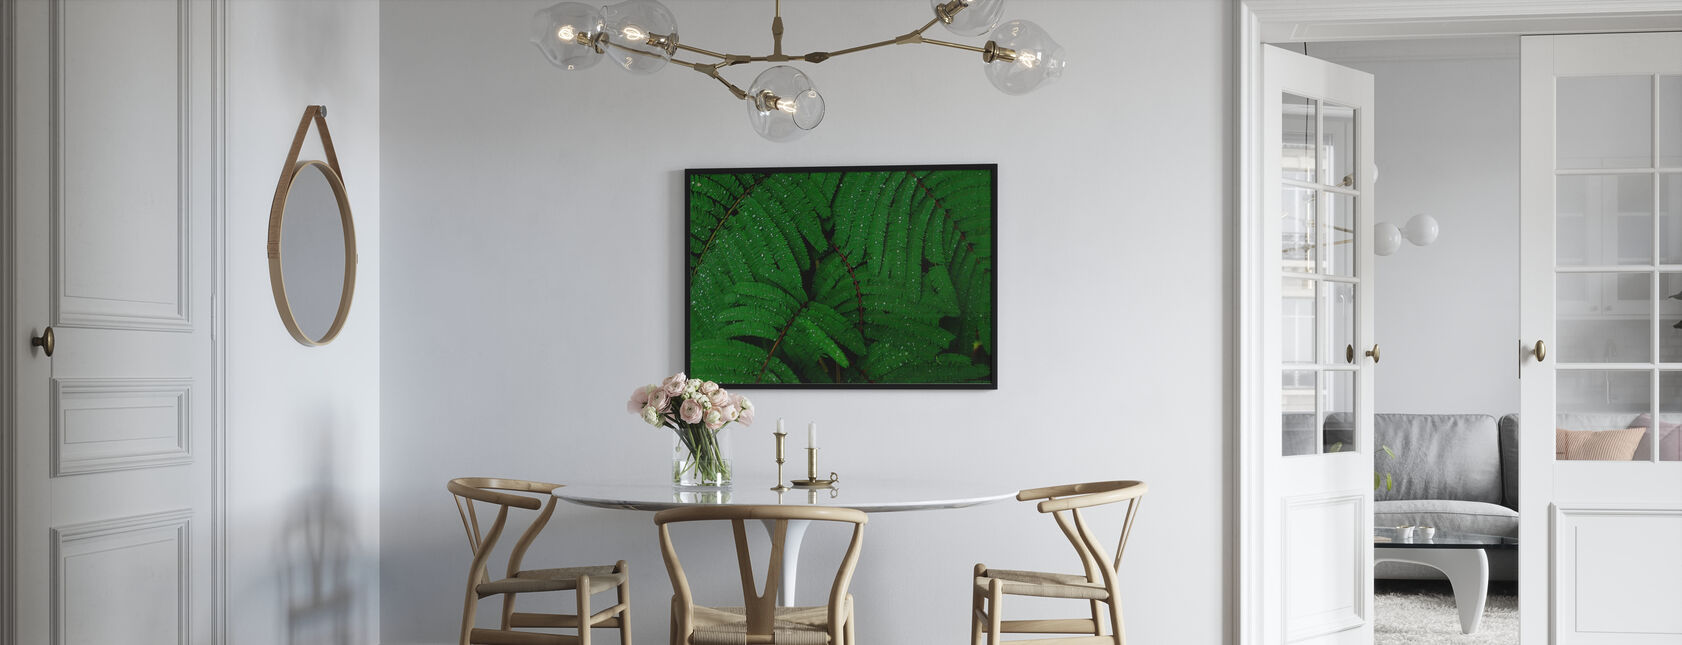 Regnskov blade - Plakat - Køkken